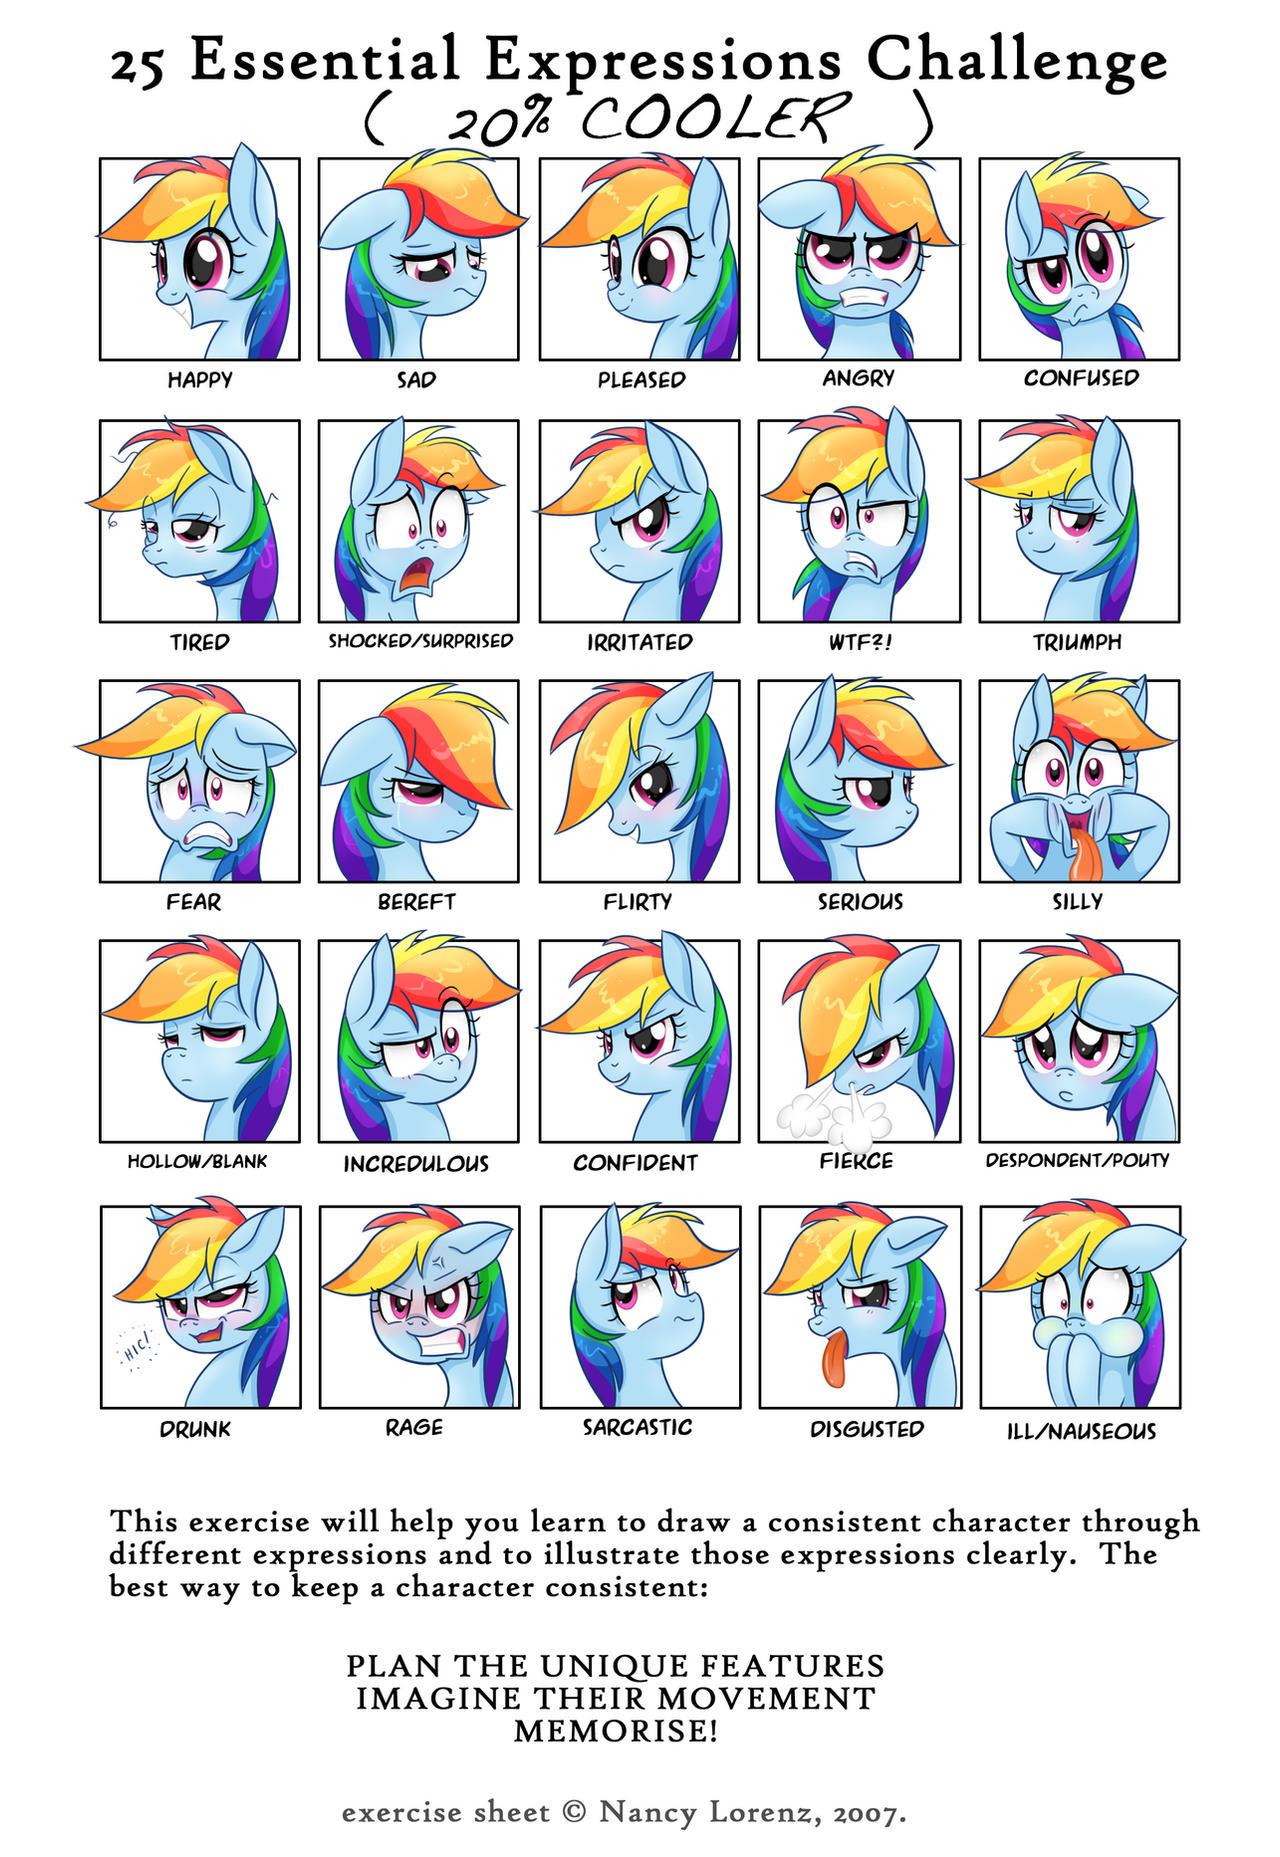 25 Essential Expressions Challenge: Rainbow Dash